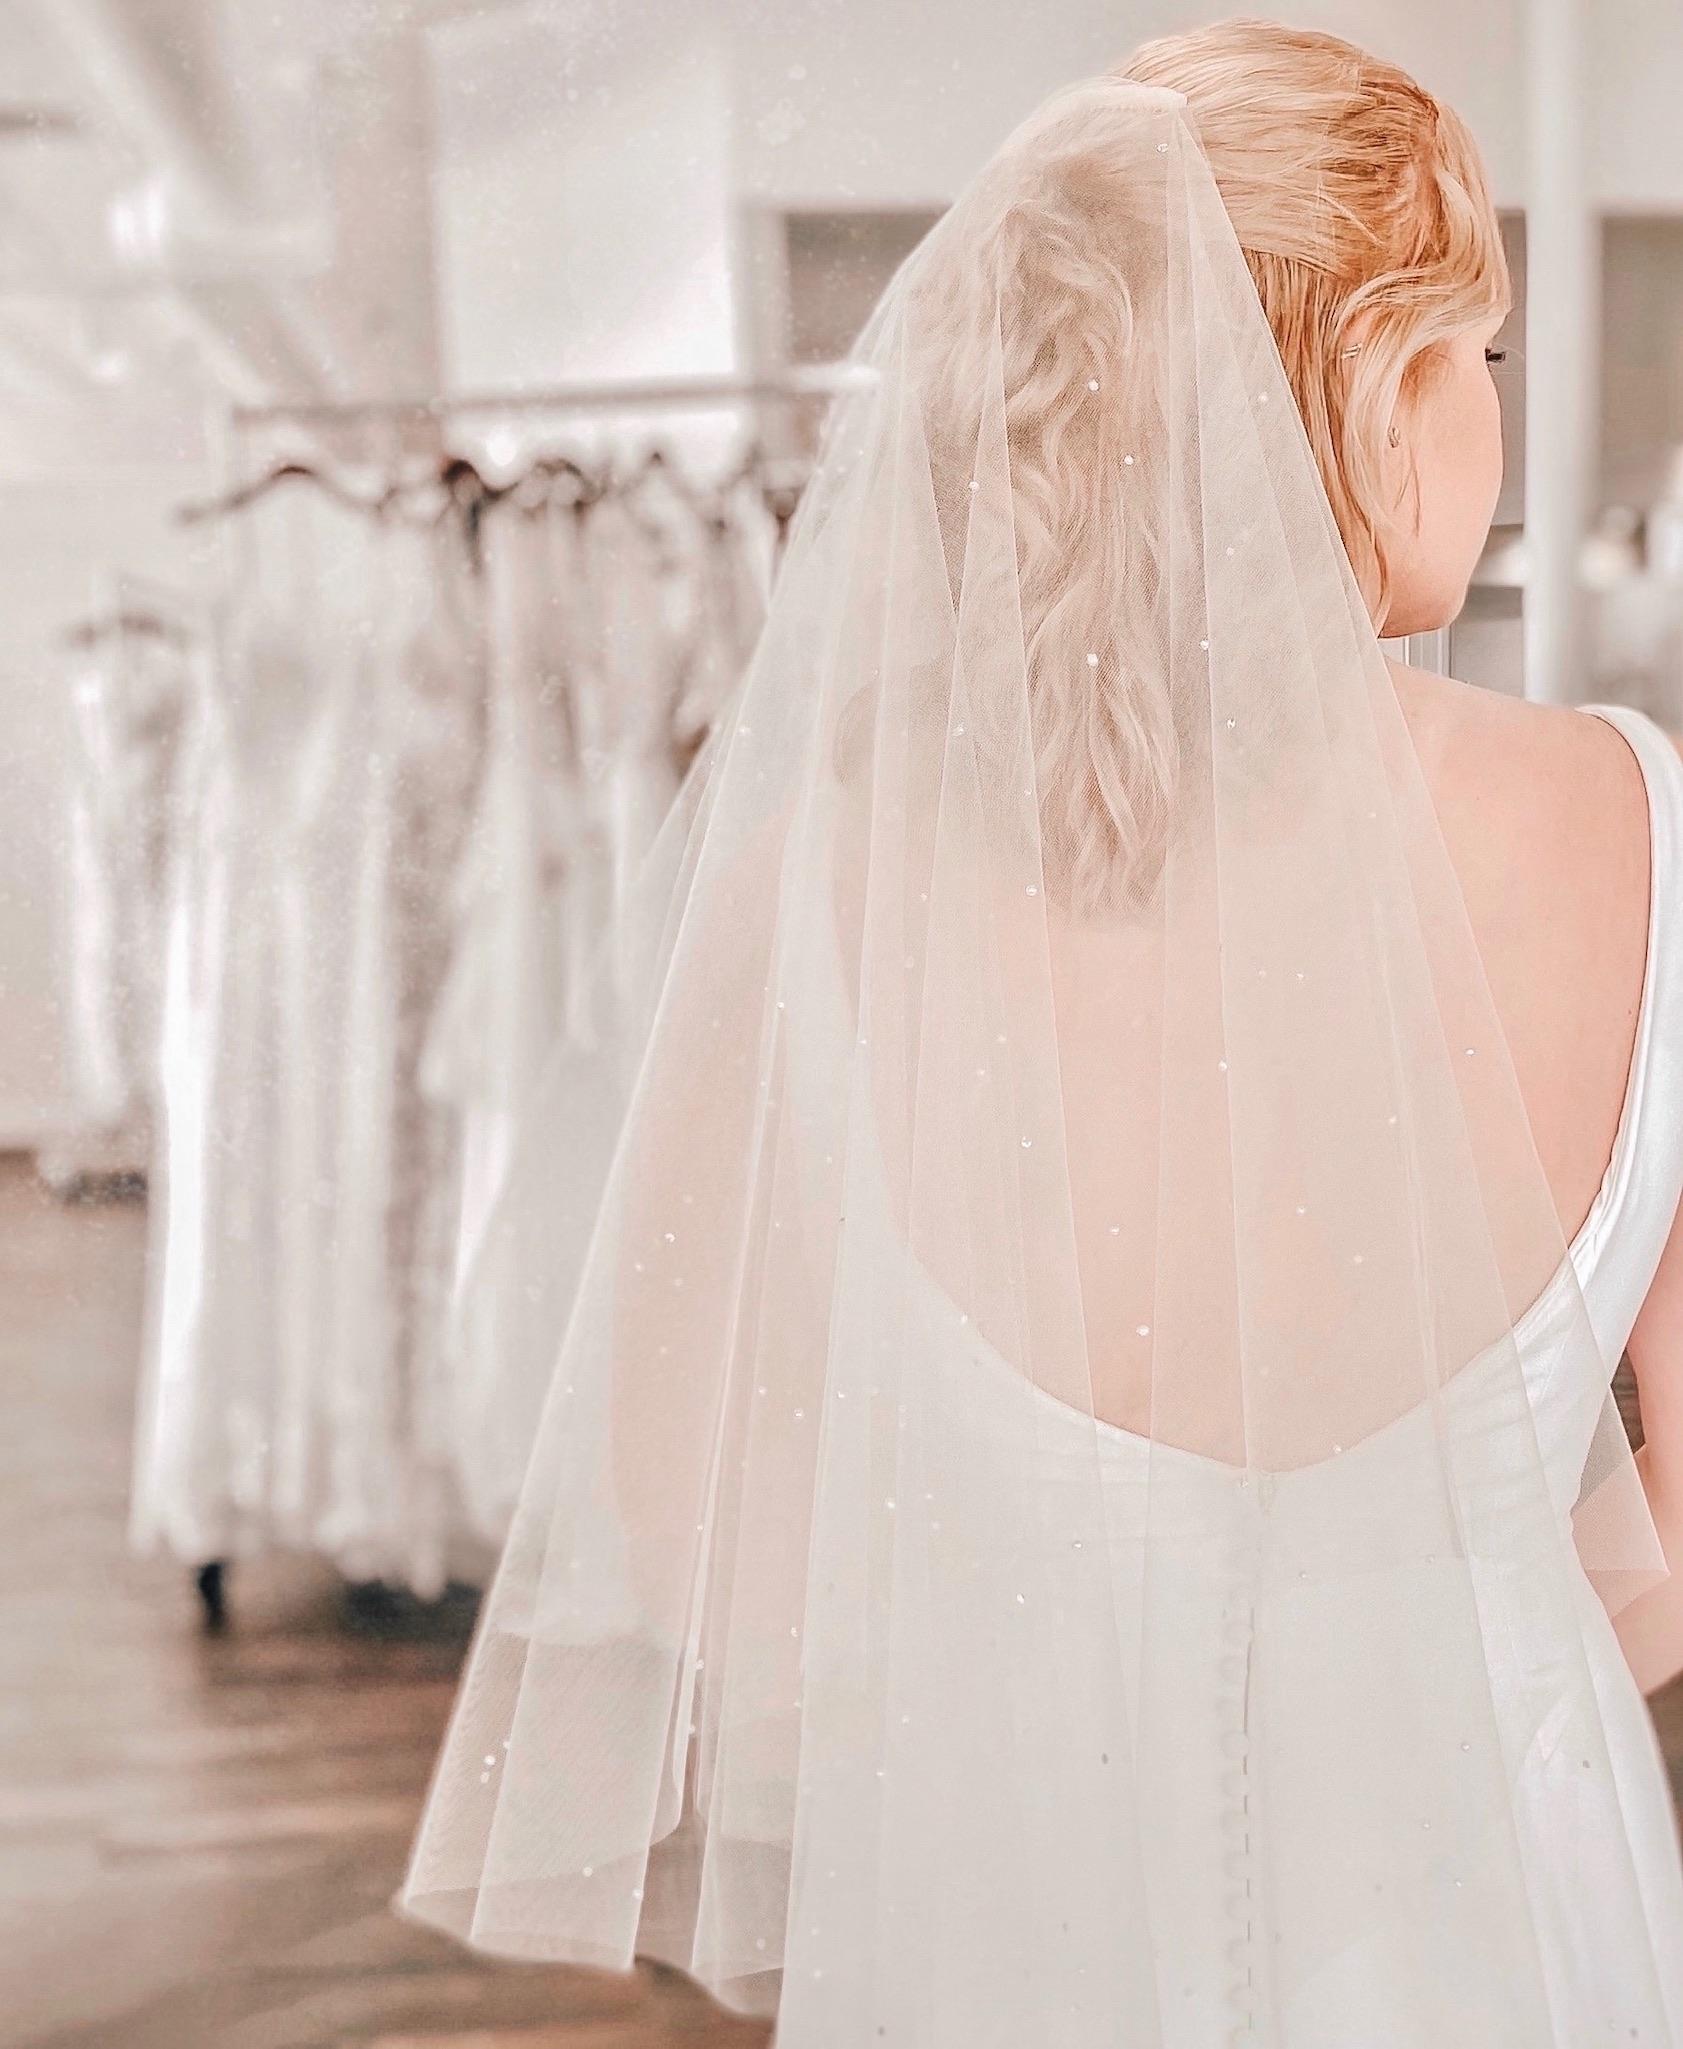 pearl veil on a wedding dress